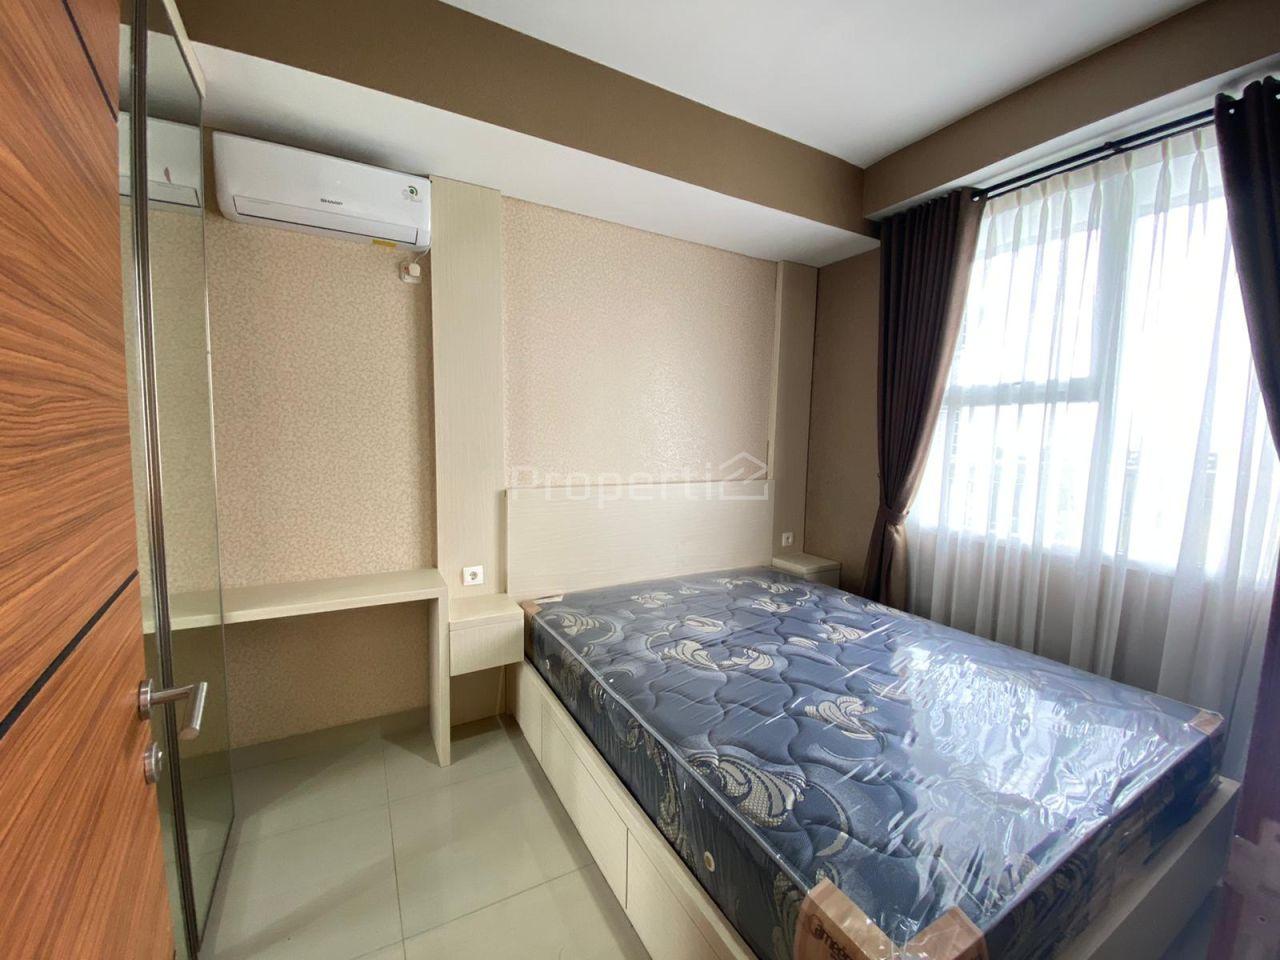 Unit Baru di Apartemen Dago Suites, Lantai 3, Jawa Barat